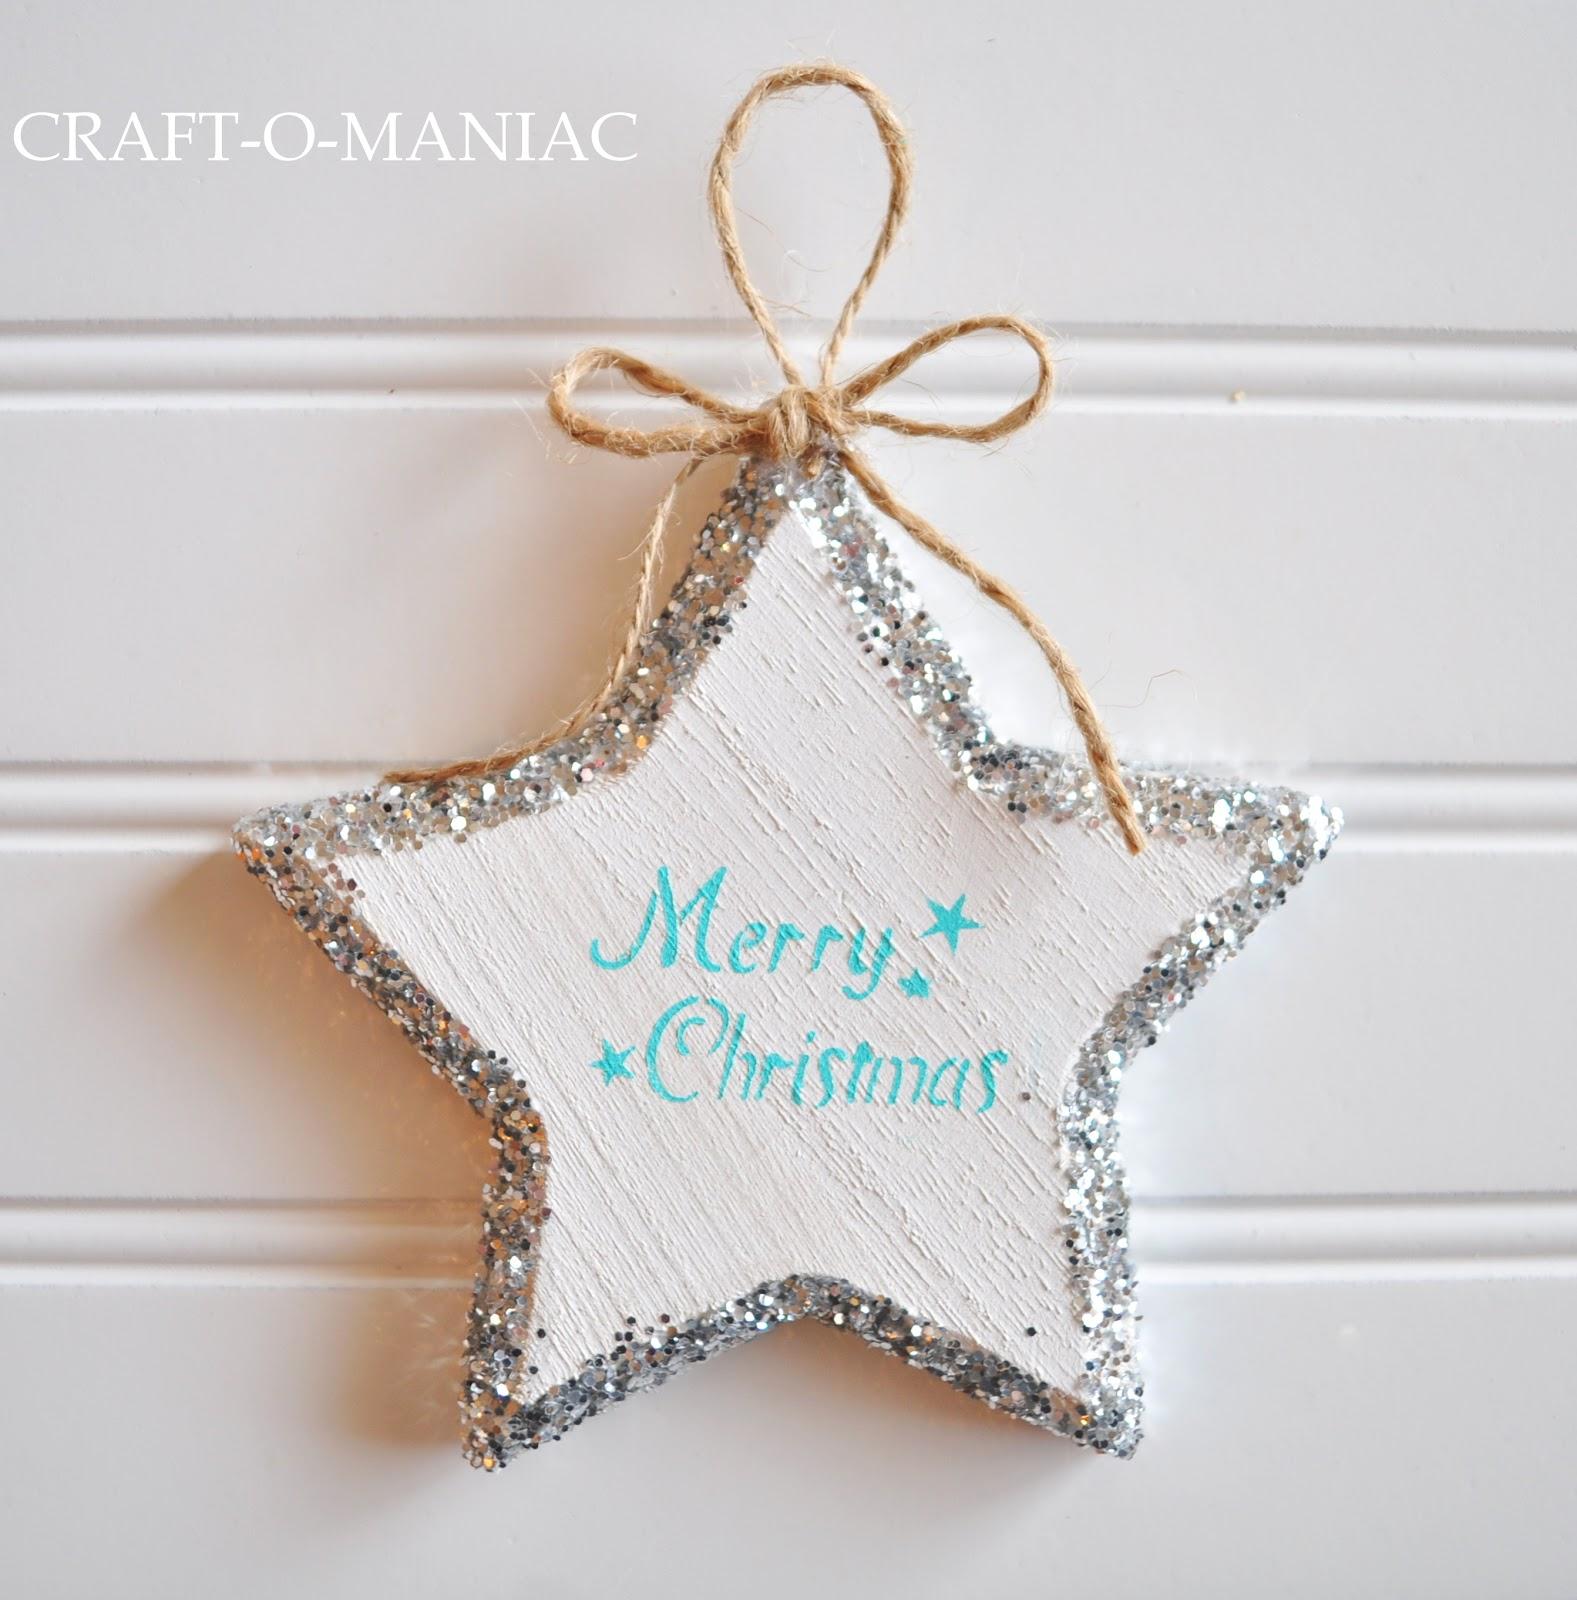 Homemade Christmas Star Ornament: DIY Star Christmas Ornament